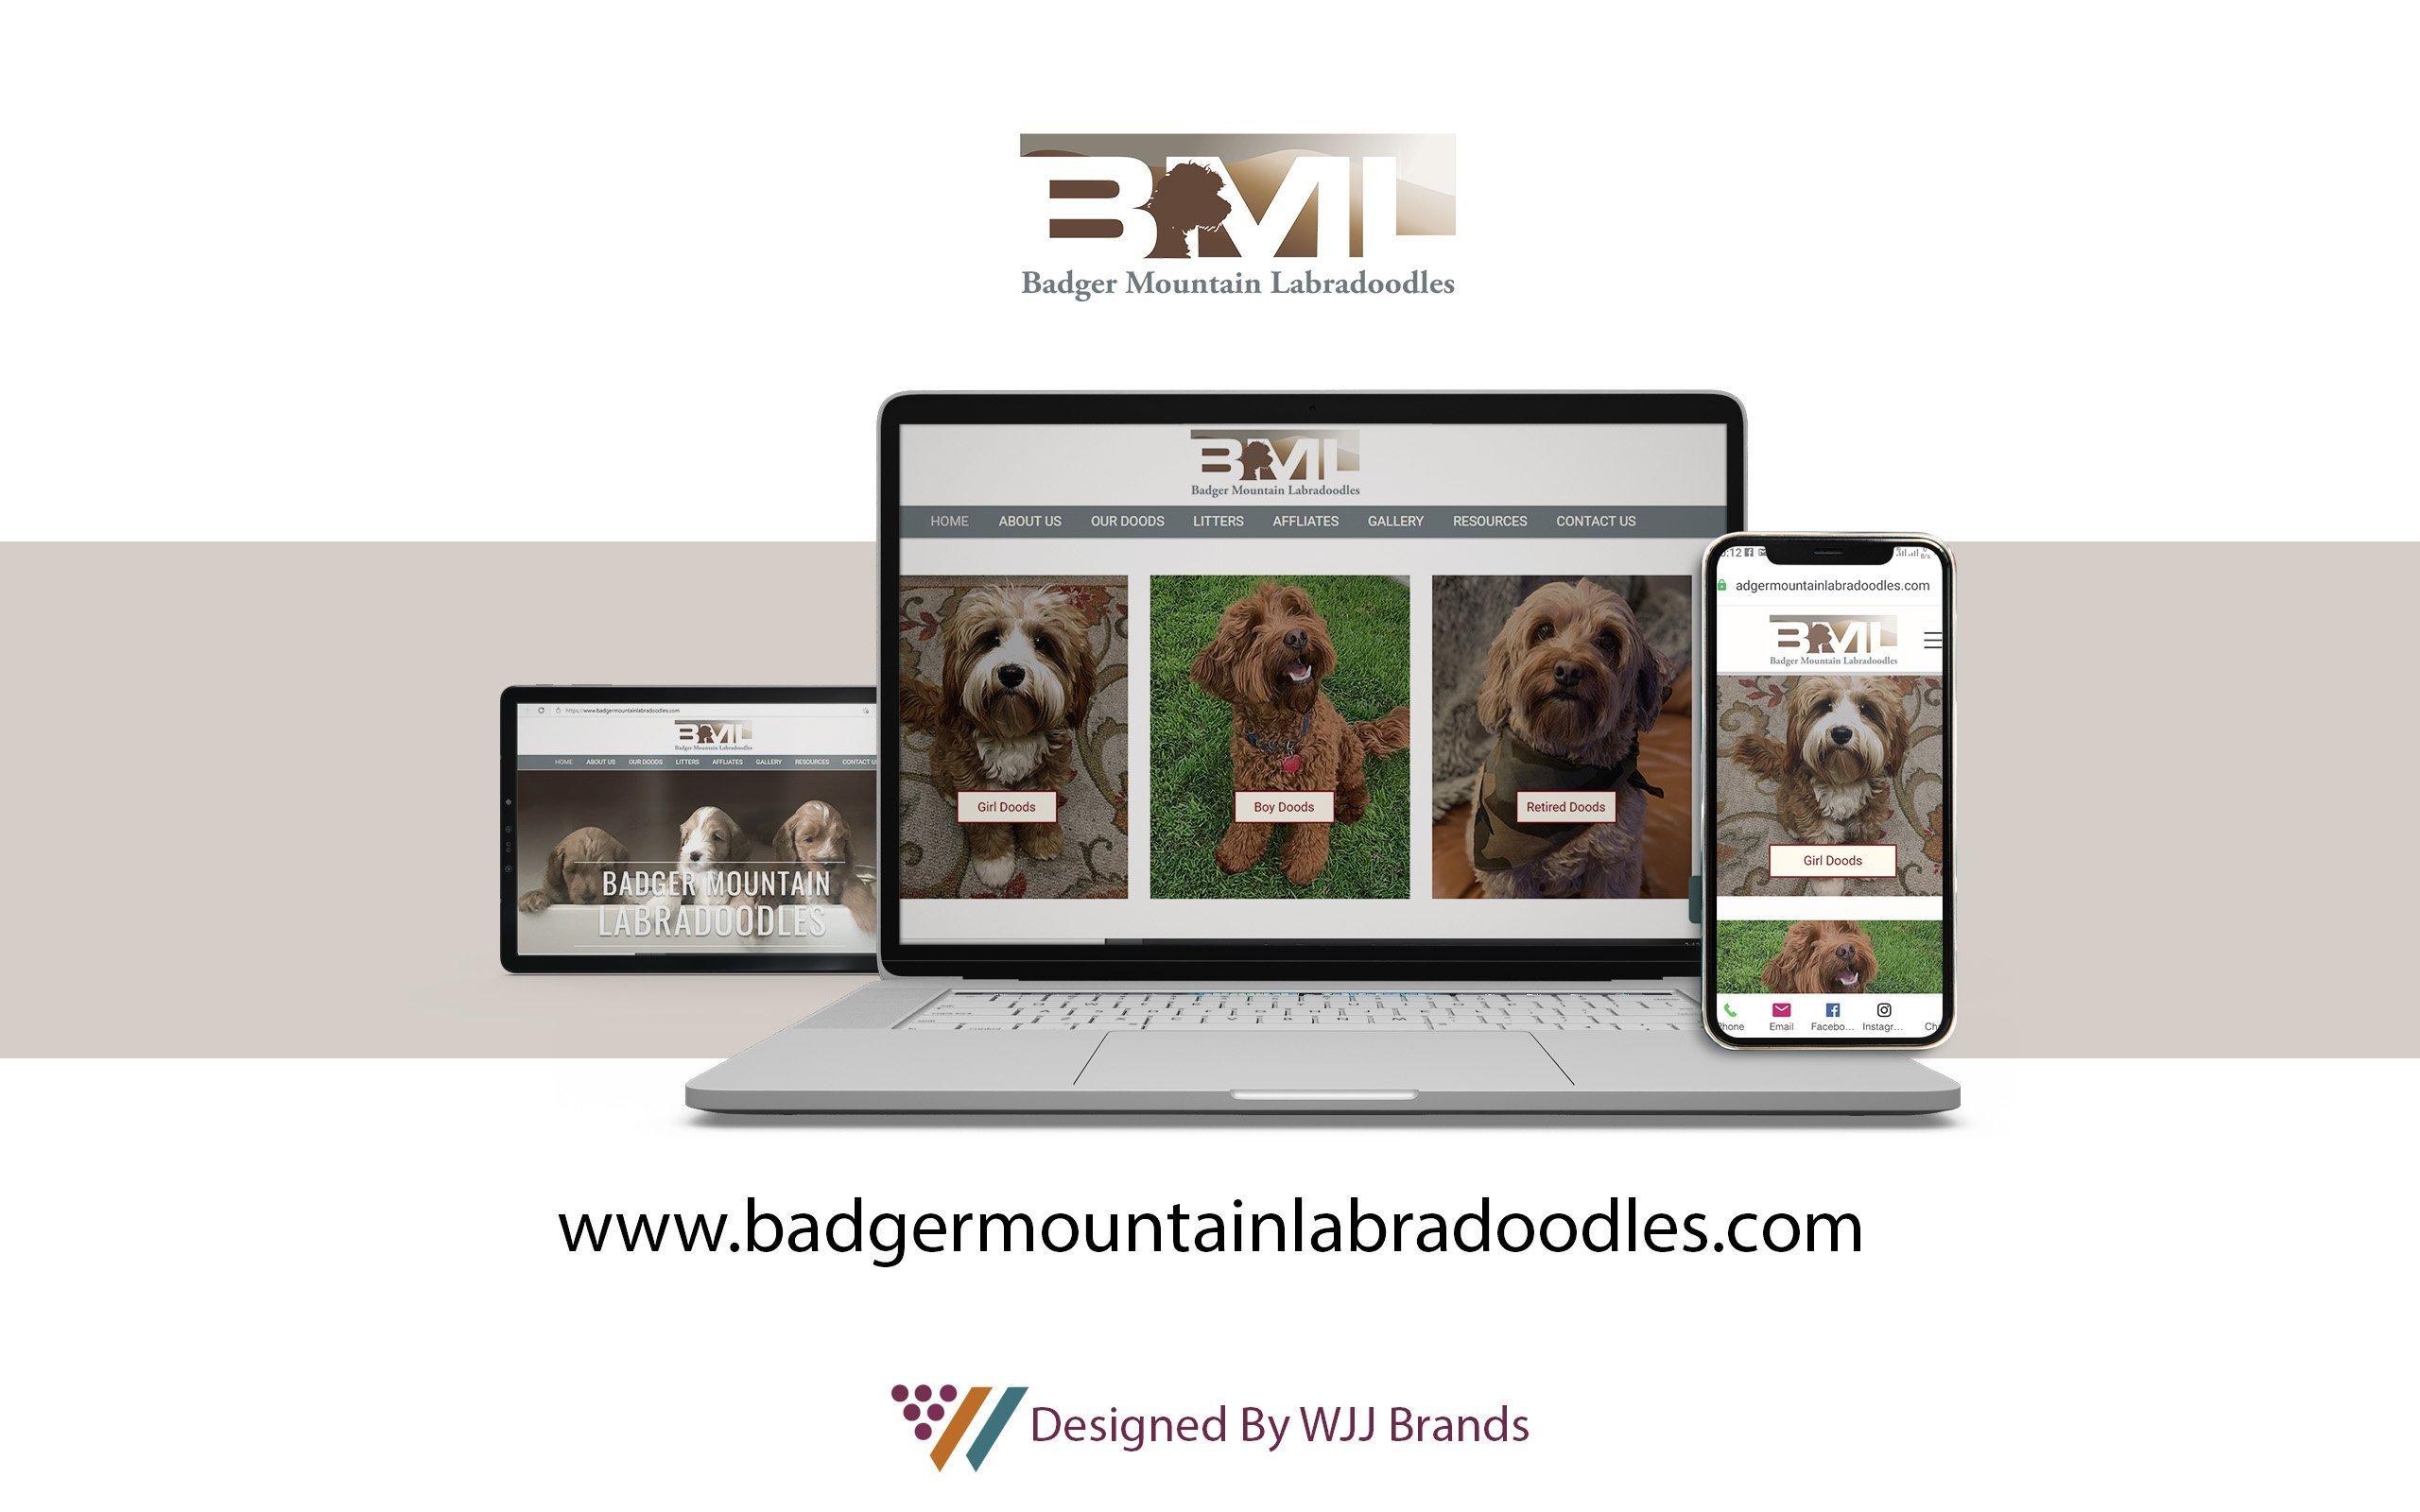 badgermountainlabradoodles web mockup